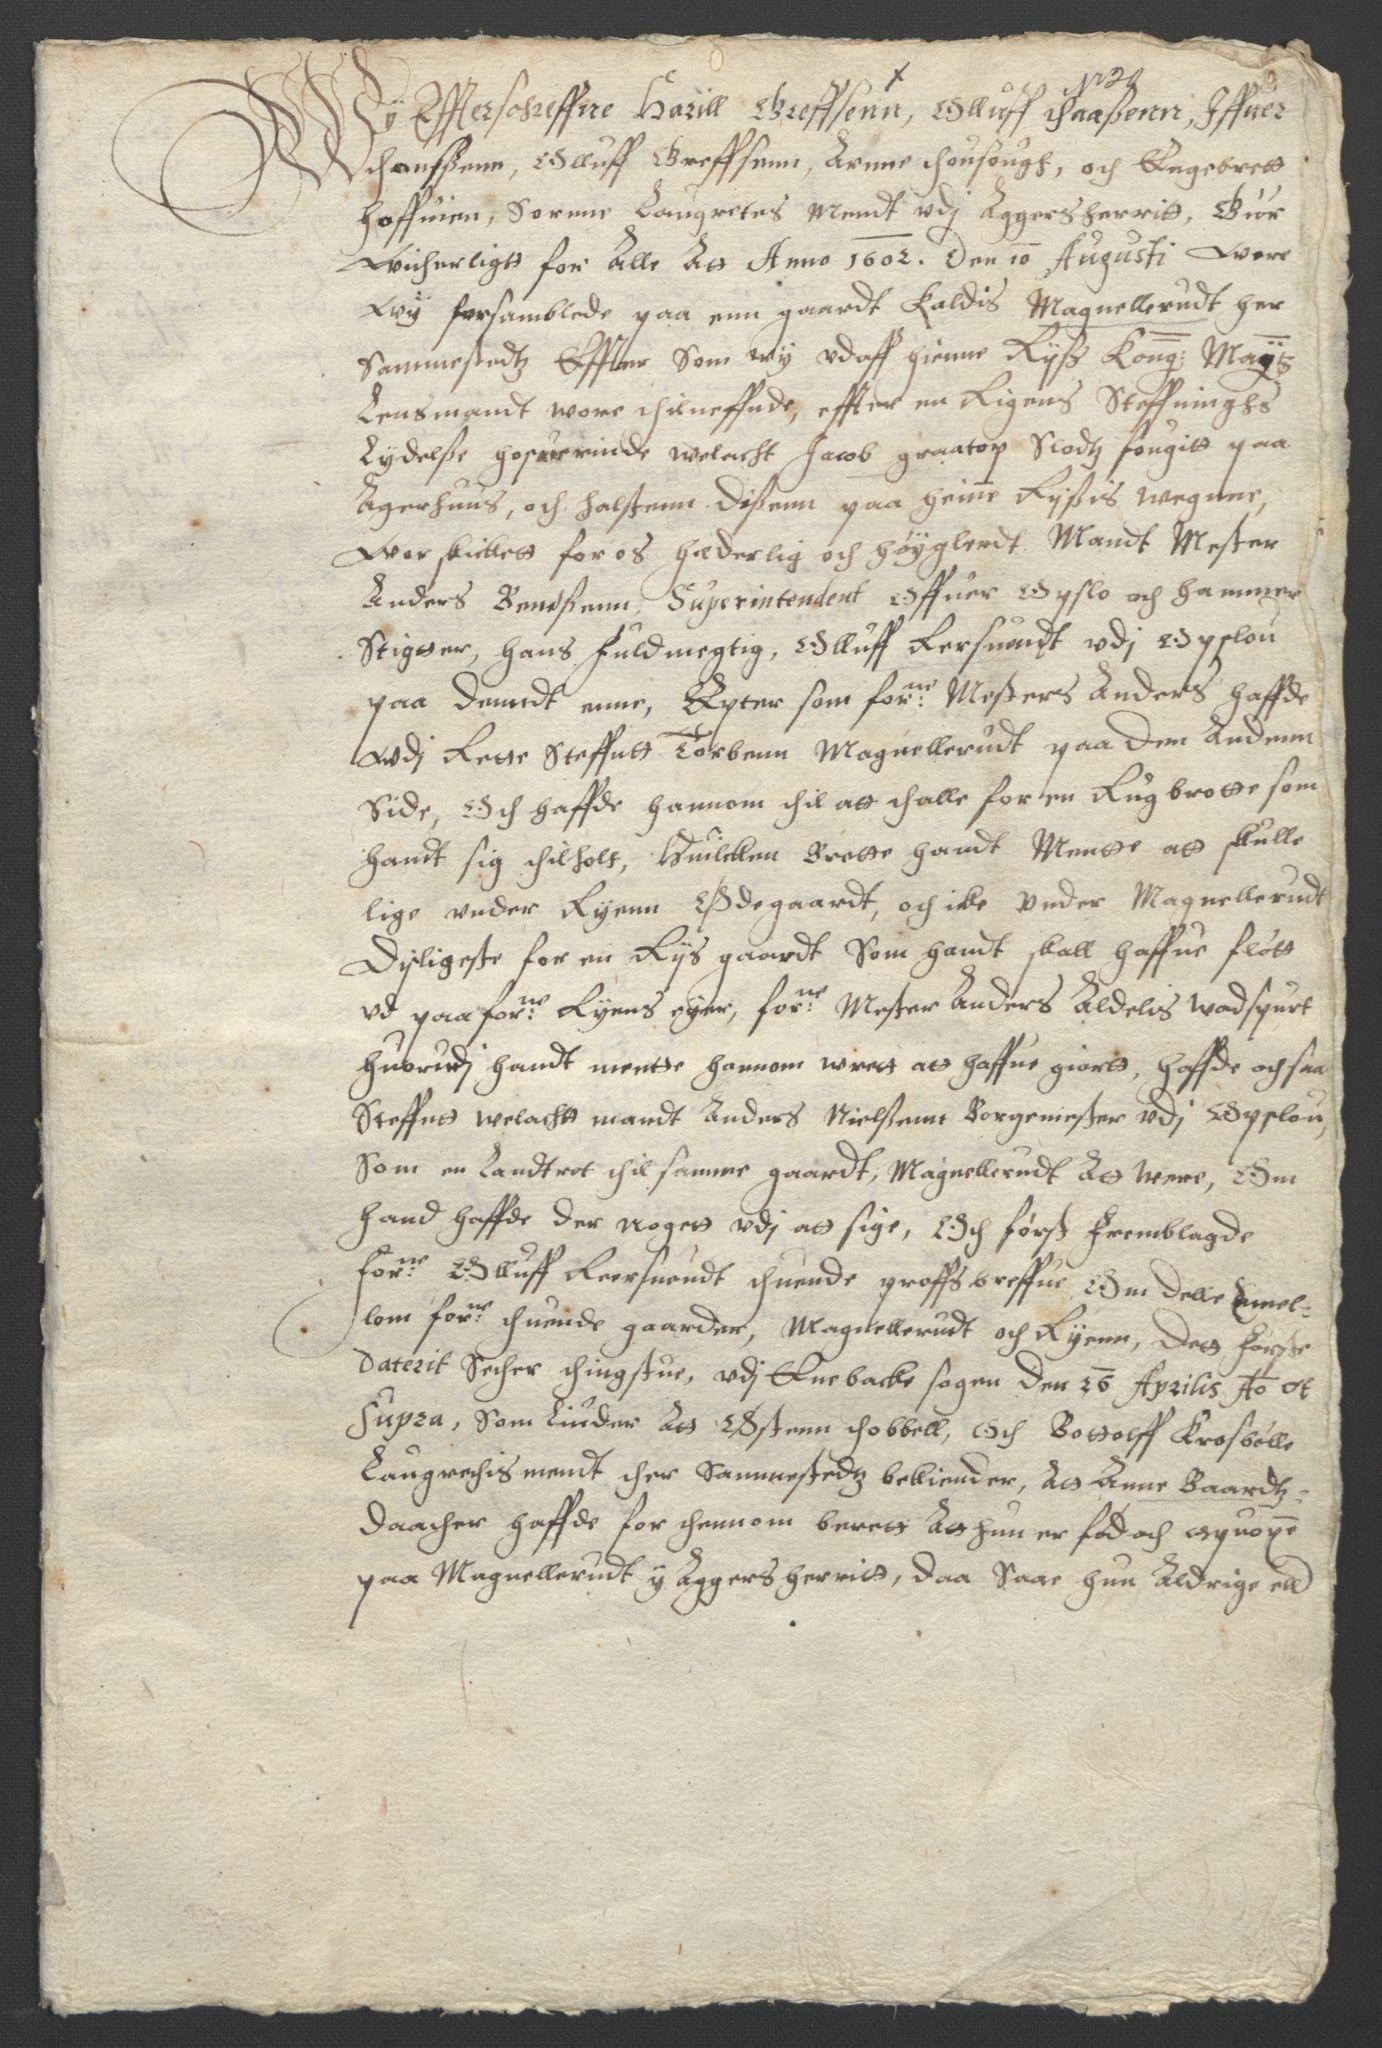 SAO, Oslo stiftsdireksjon, G/Gb/L0001: Bispestolens dokumenter, 1584-1612, s. 20